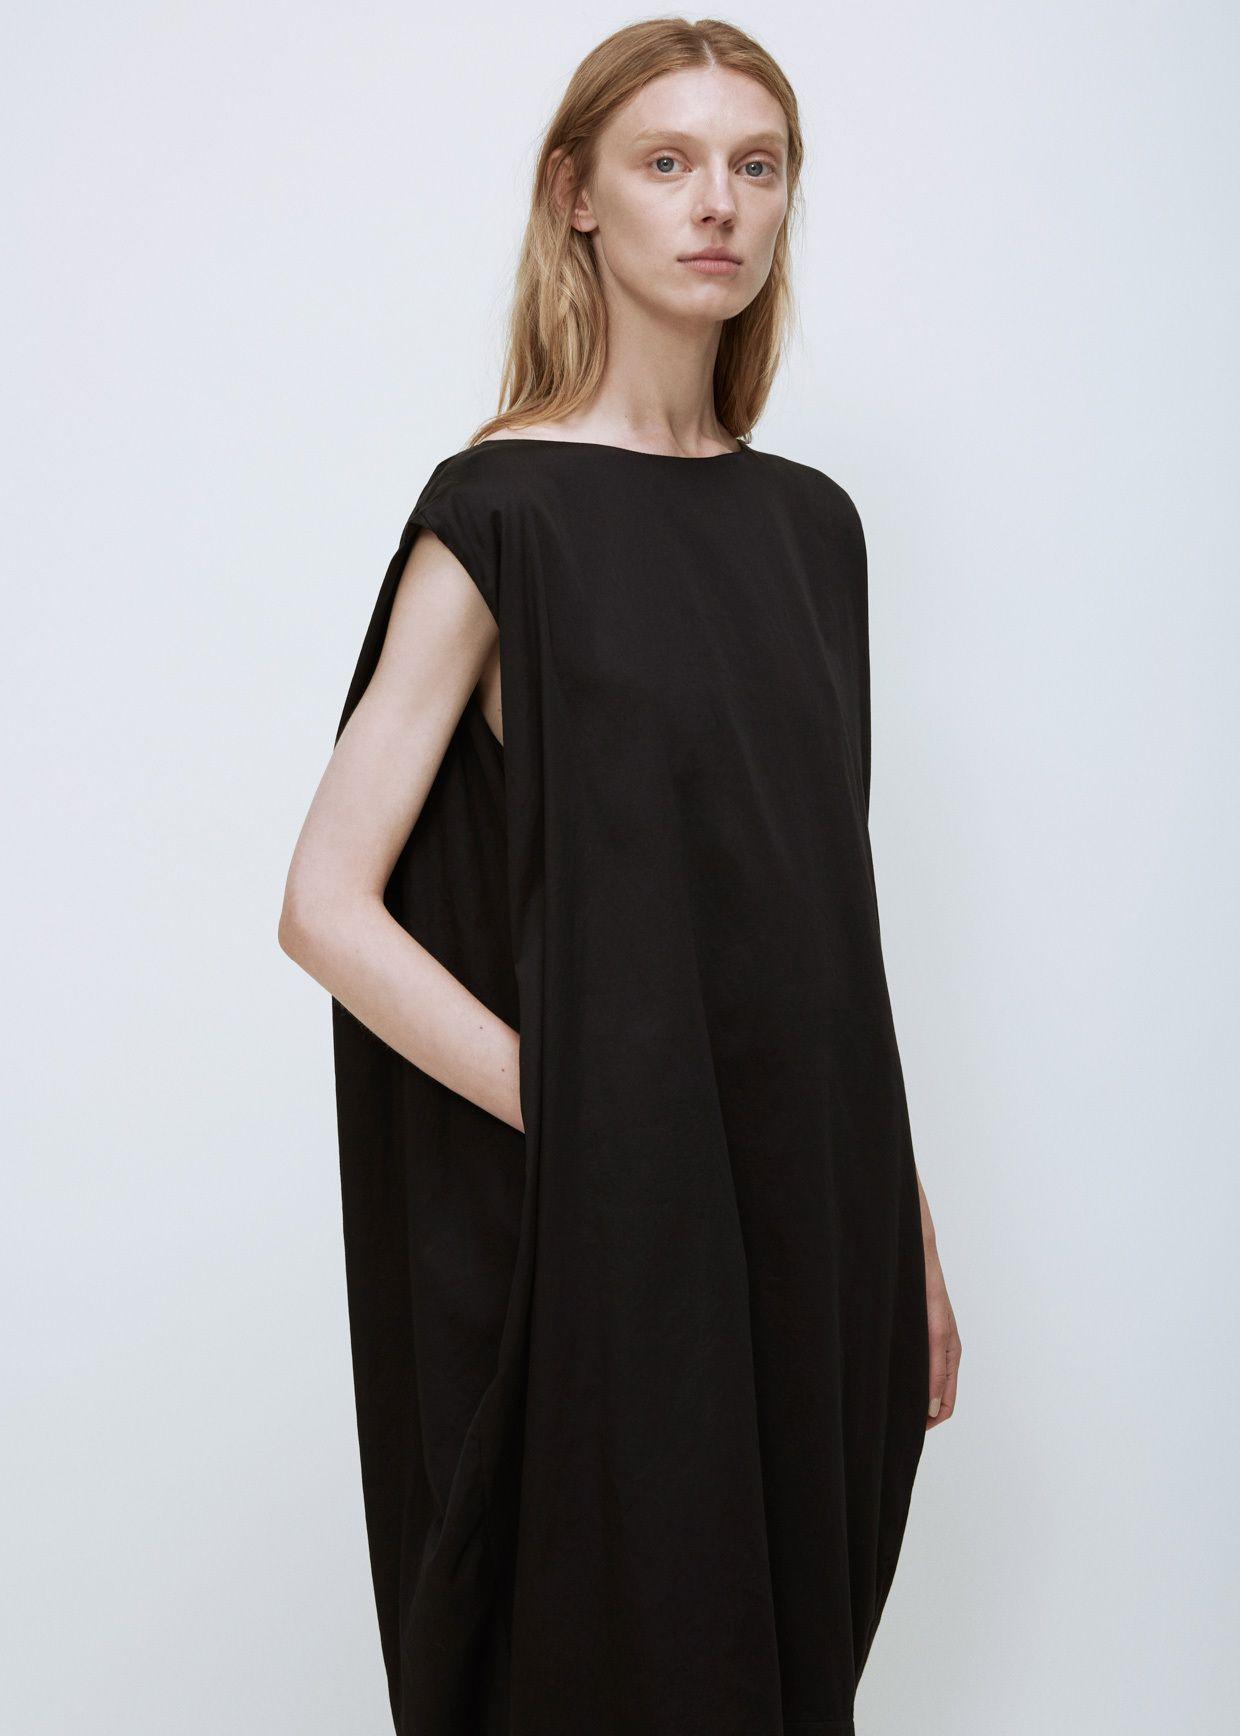 Totokaelo - Black Crane Black Accordion Dress